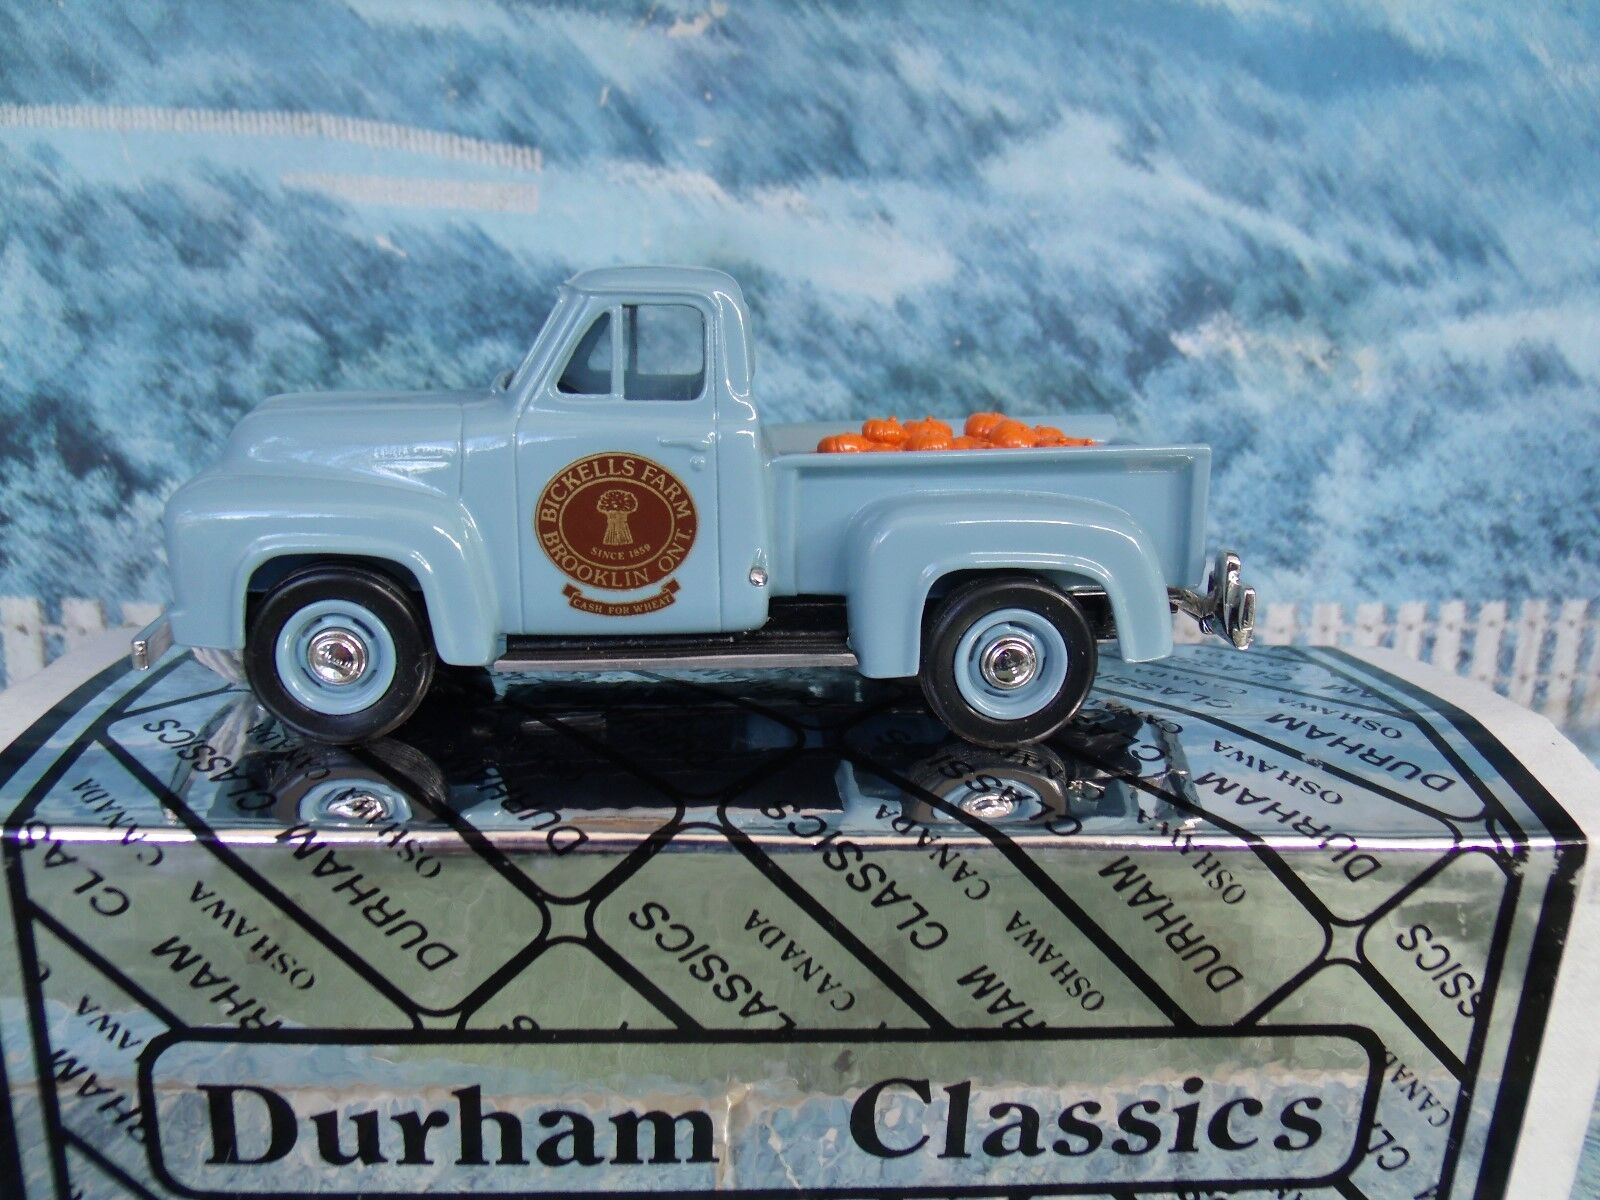 precios bajos todos los dias 1/43 media tonelada de Durham Classics Ford 2018 Pick-up Pick-up Pick-up bickells Farm  grandes ahorros